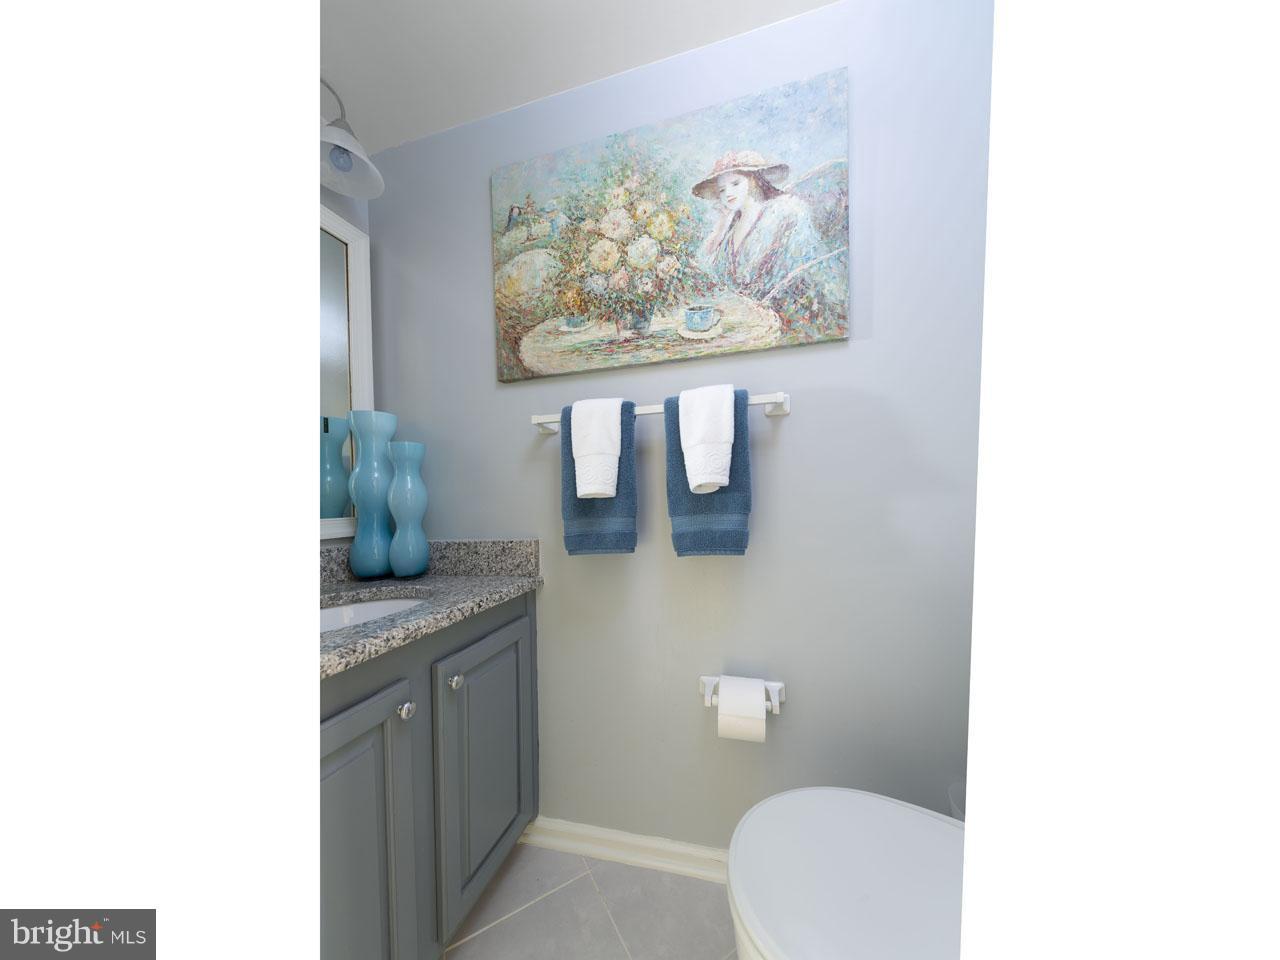 1002640508-300537944361-2021-07-22-05-00-37     Pinecrest   Alexandria Delaware Real Estate For Sale   MLS# 1002640508  - Best of Northern Virginia